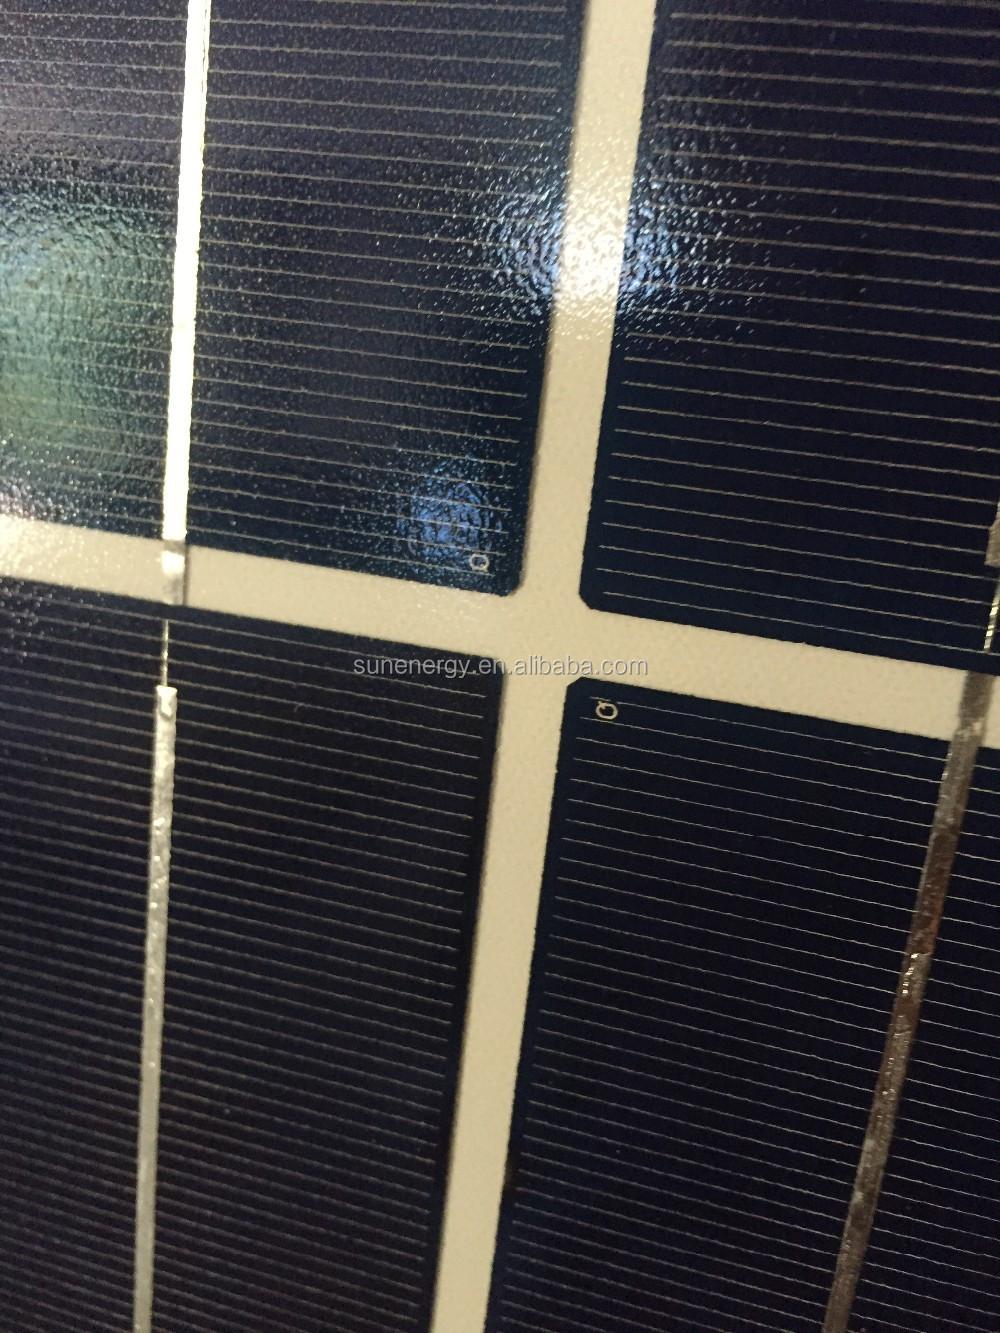 germany solar panels with 60 Q cells Q PRO-G3 260, View germany solar  panels, Q CELLS Product Details from Jinhua Sun Energy Co , Ltd  on  Alibaba com